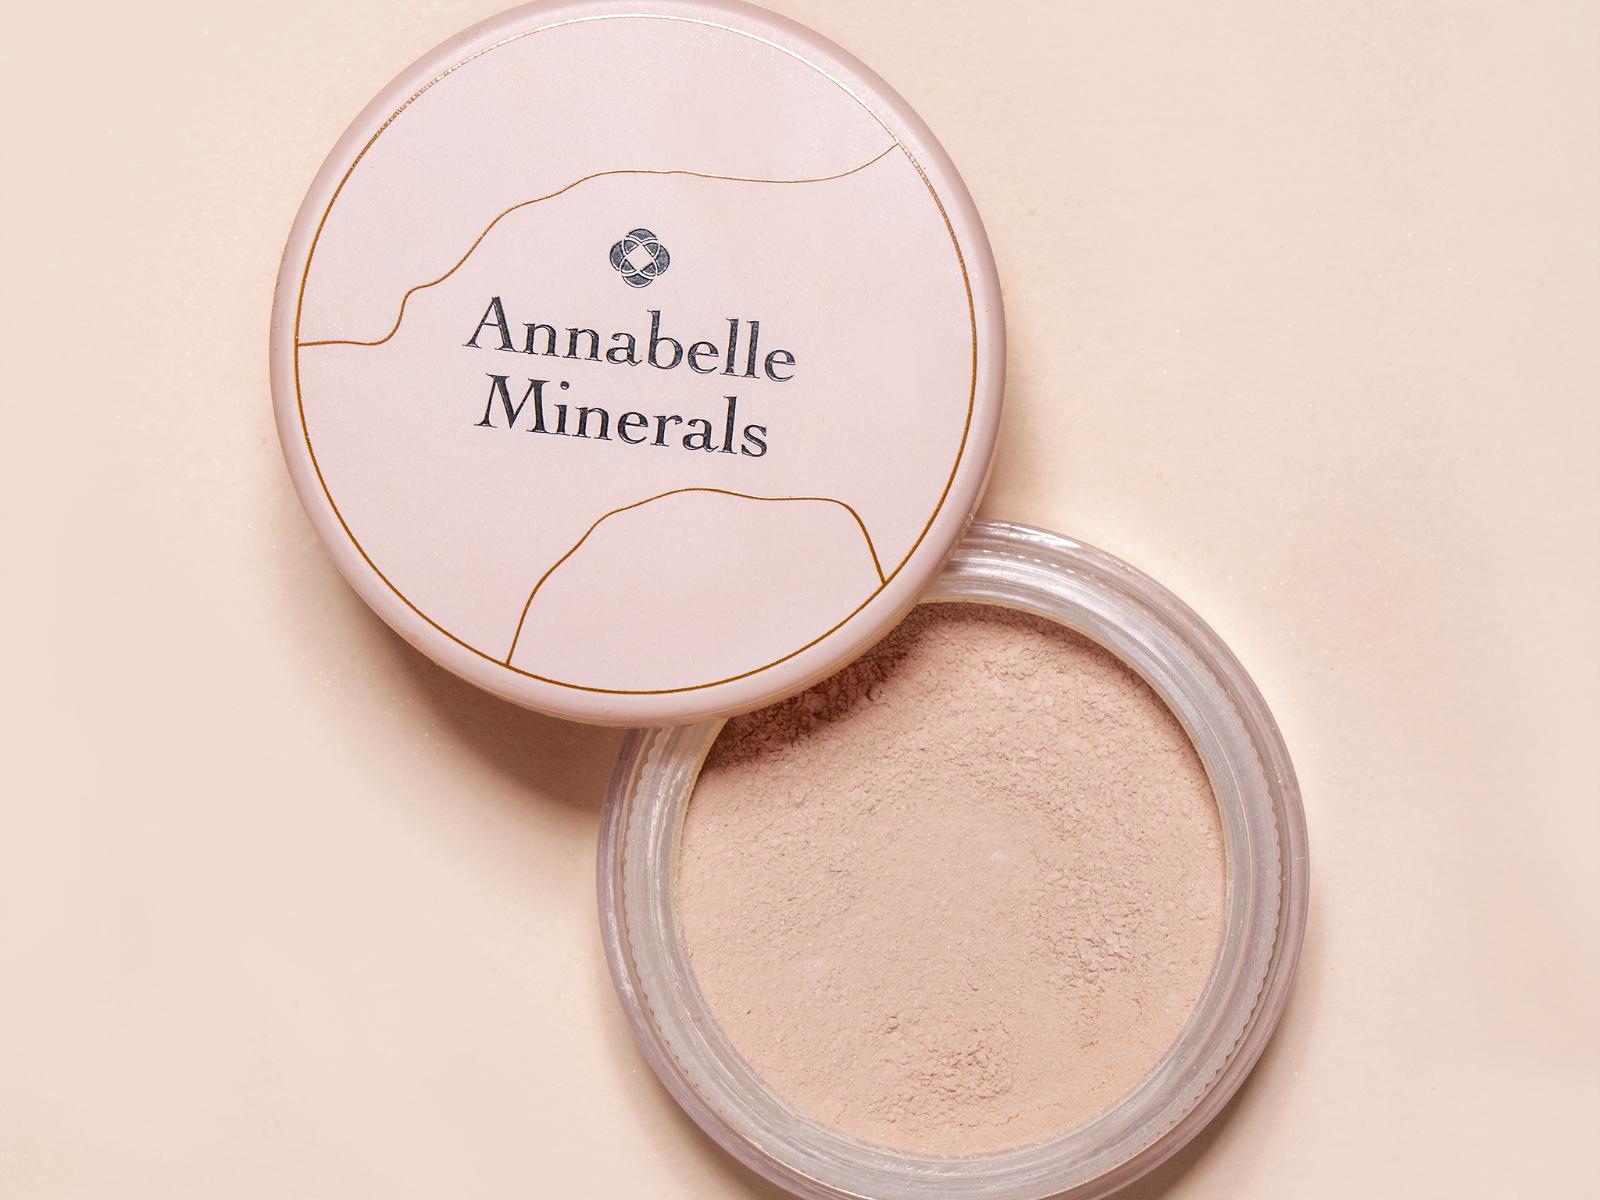 Primer glinkowy Pretty Neutral Annabelle Minerals